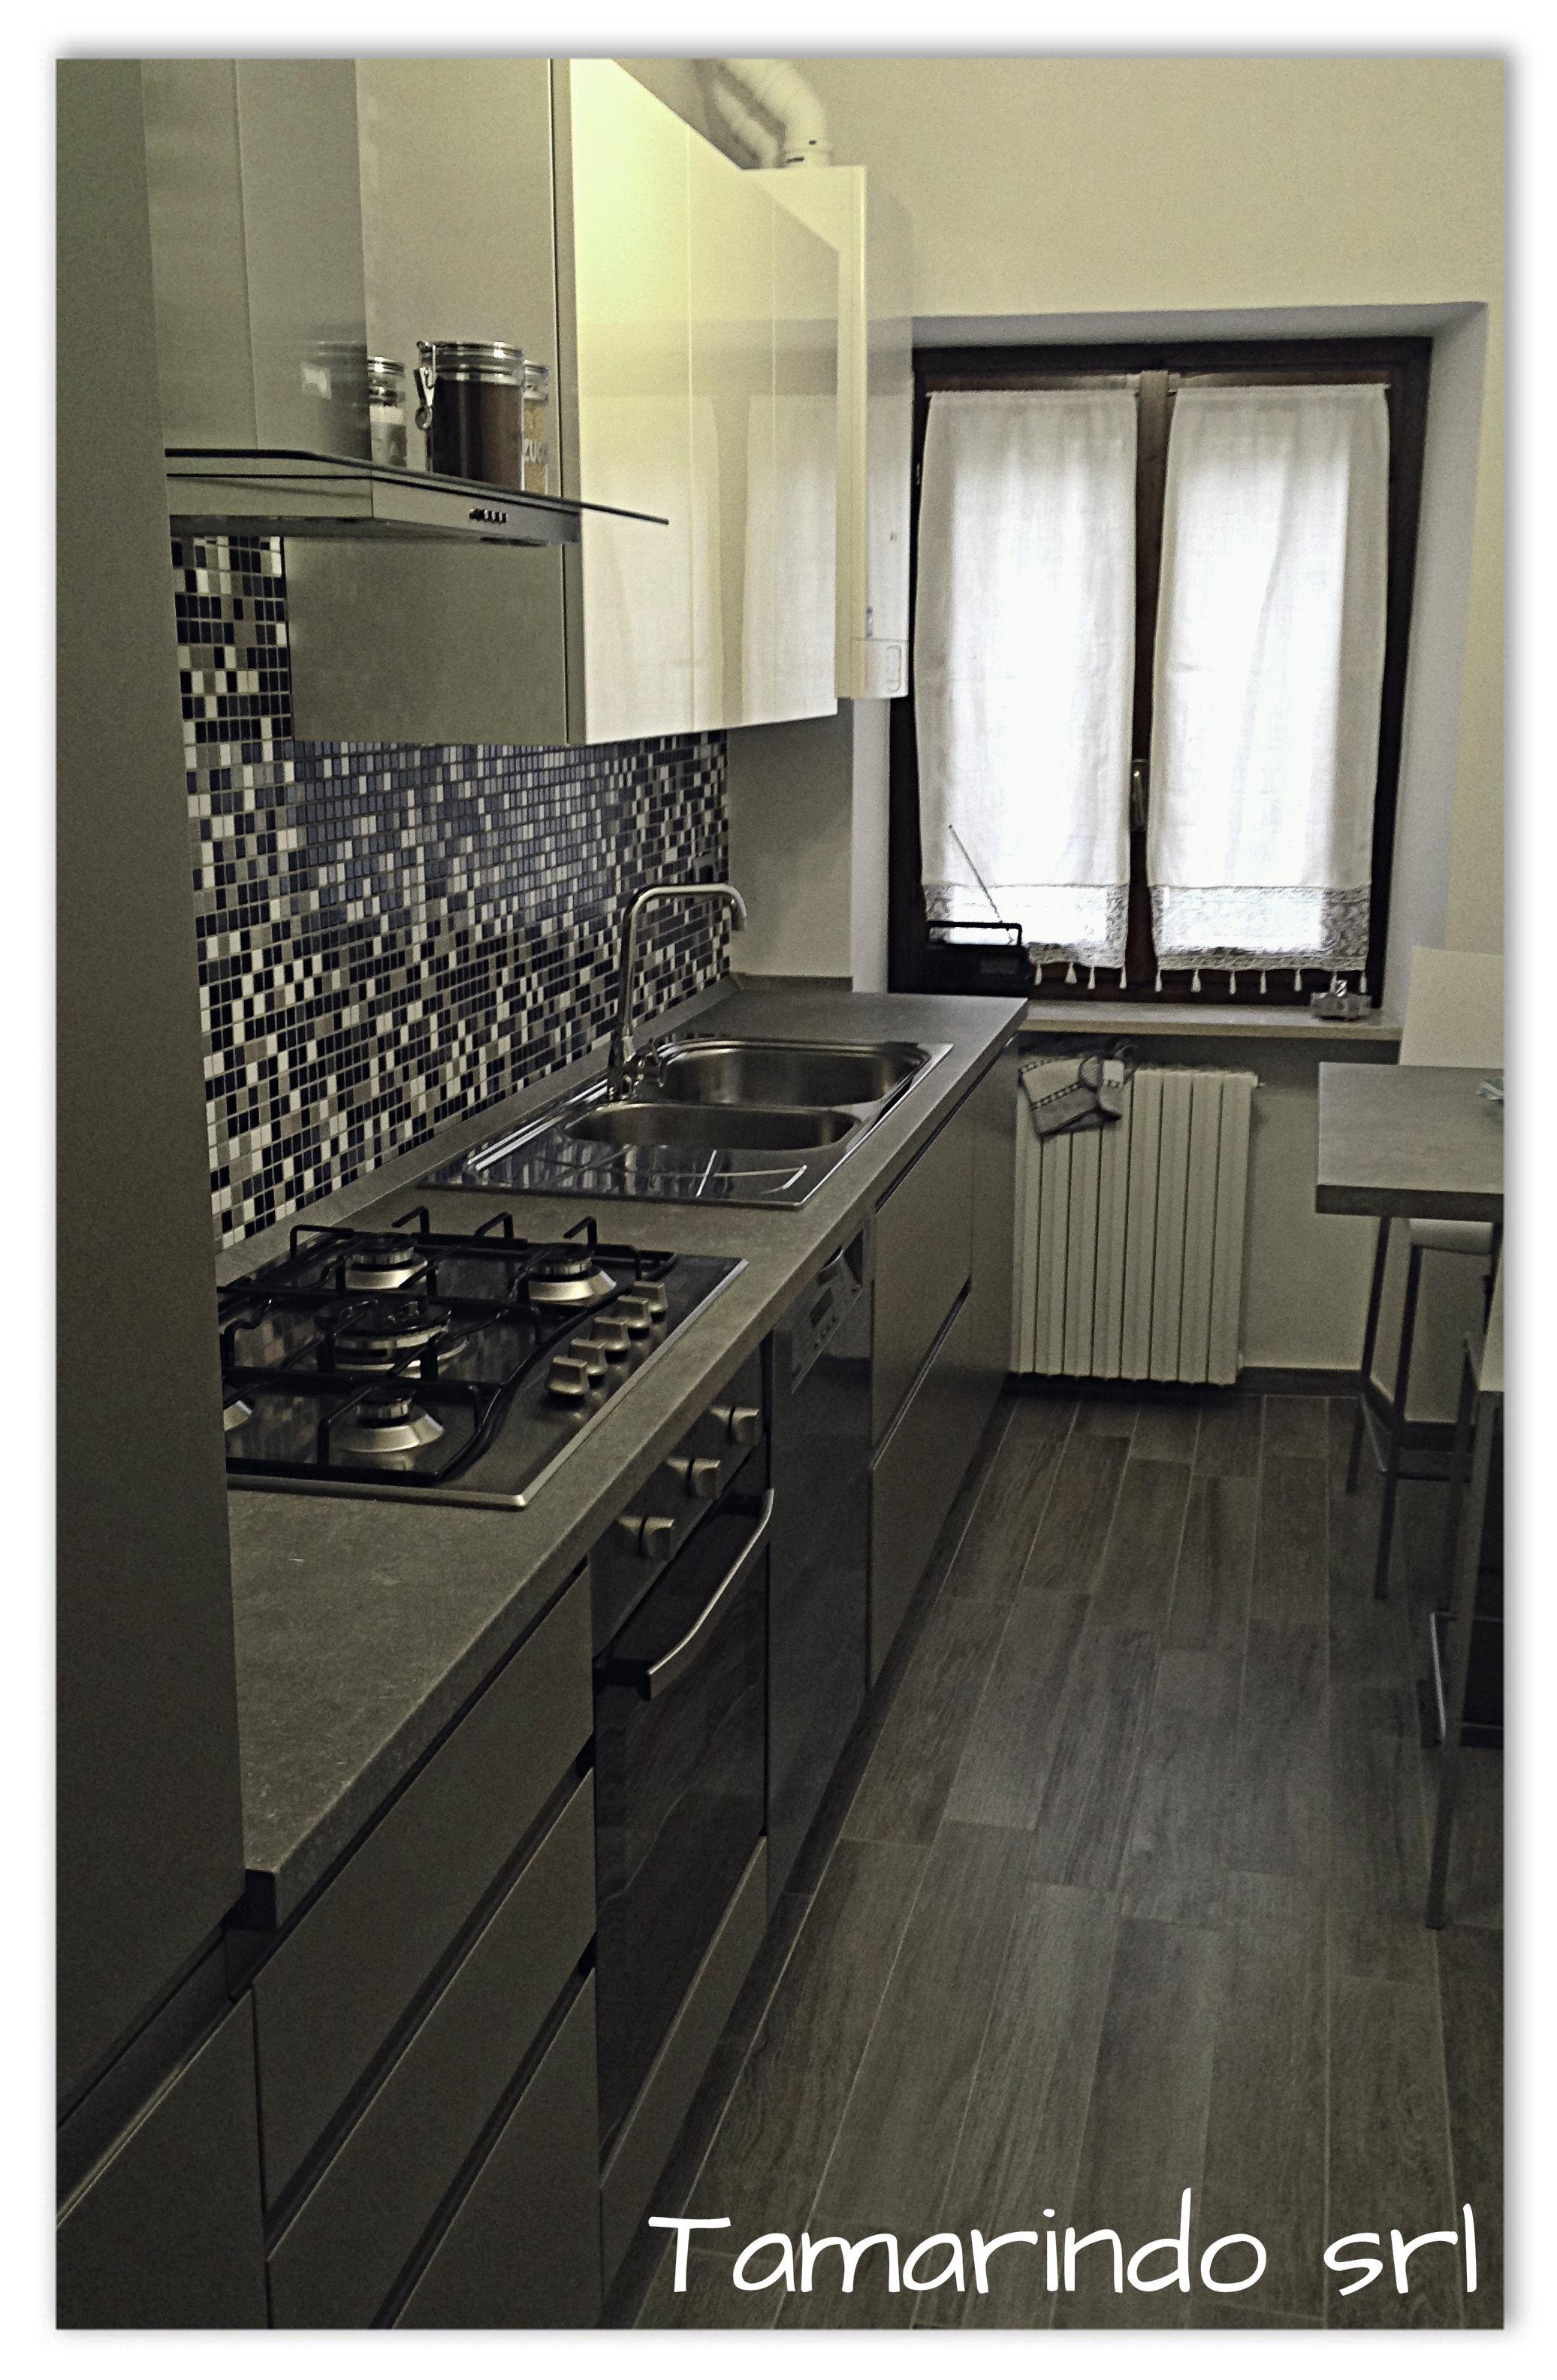 Mosaico appiani e doccia disenia tamarindo s r l - Mosaico per cucina ...